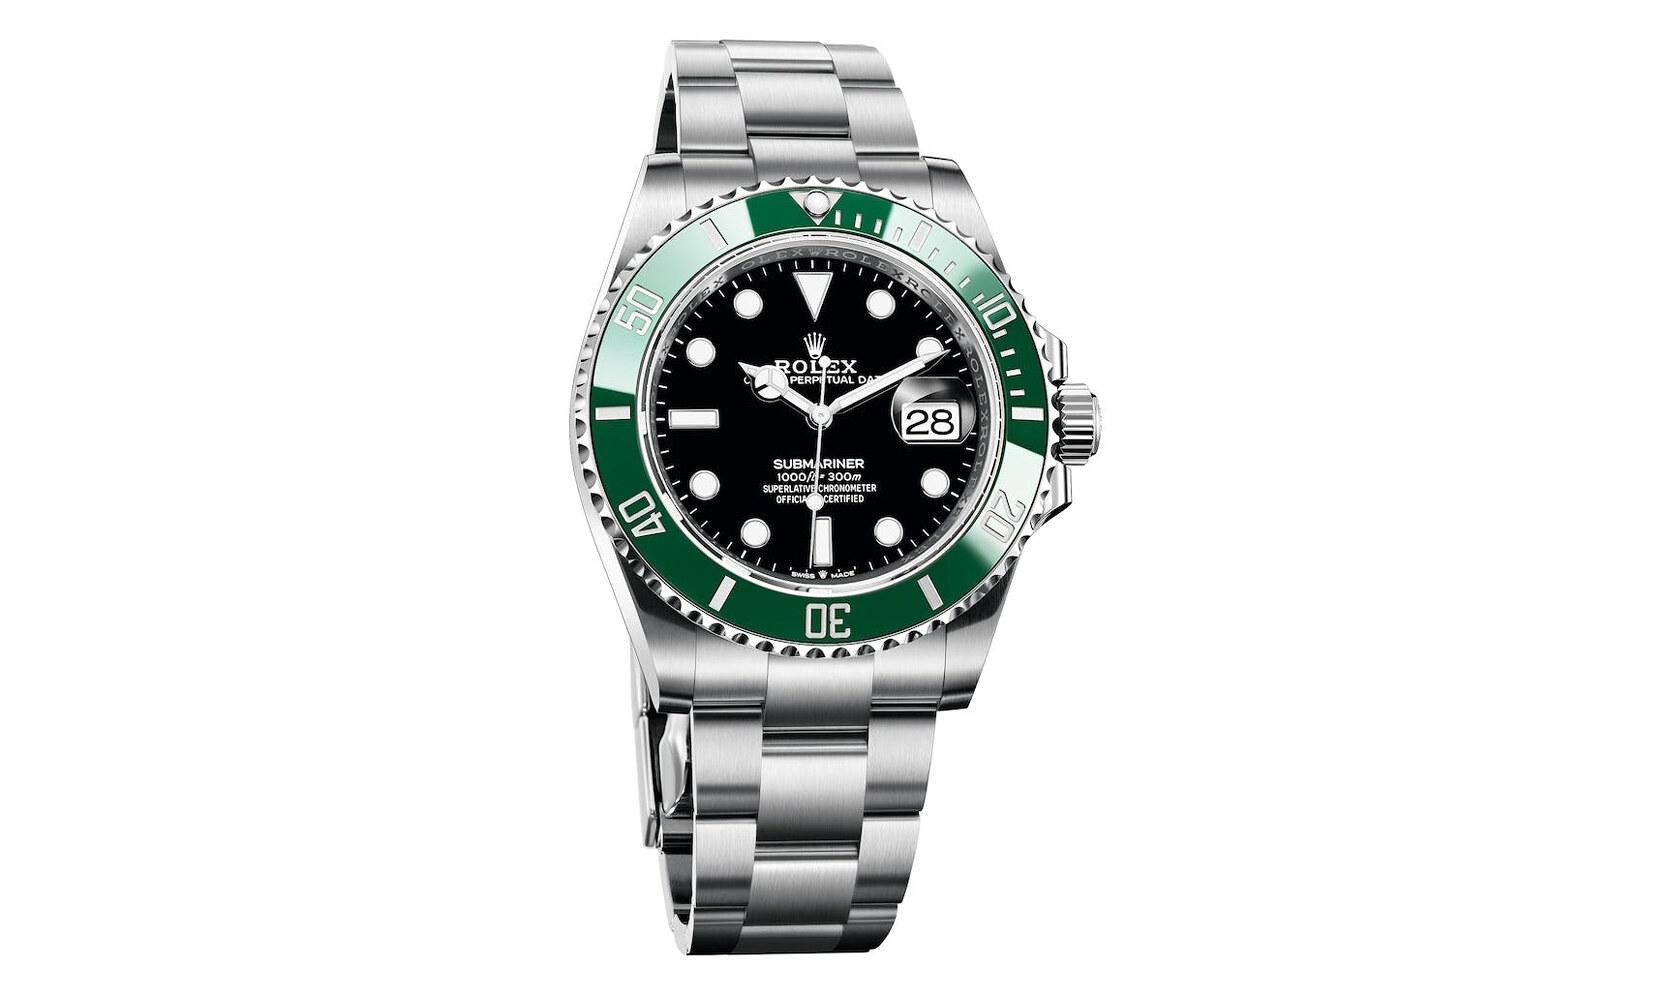 Rolex Submariner Date Oystersteel Green Bezel